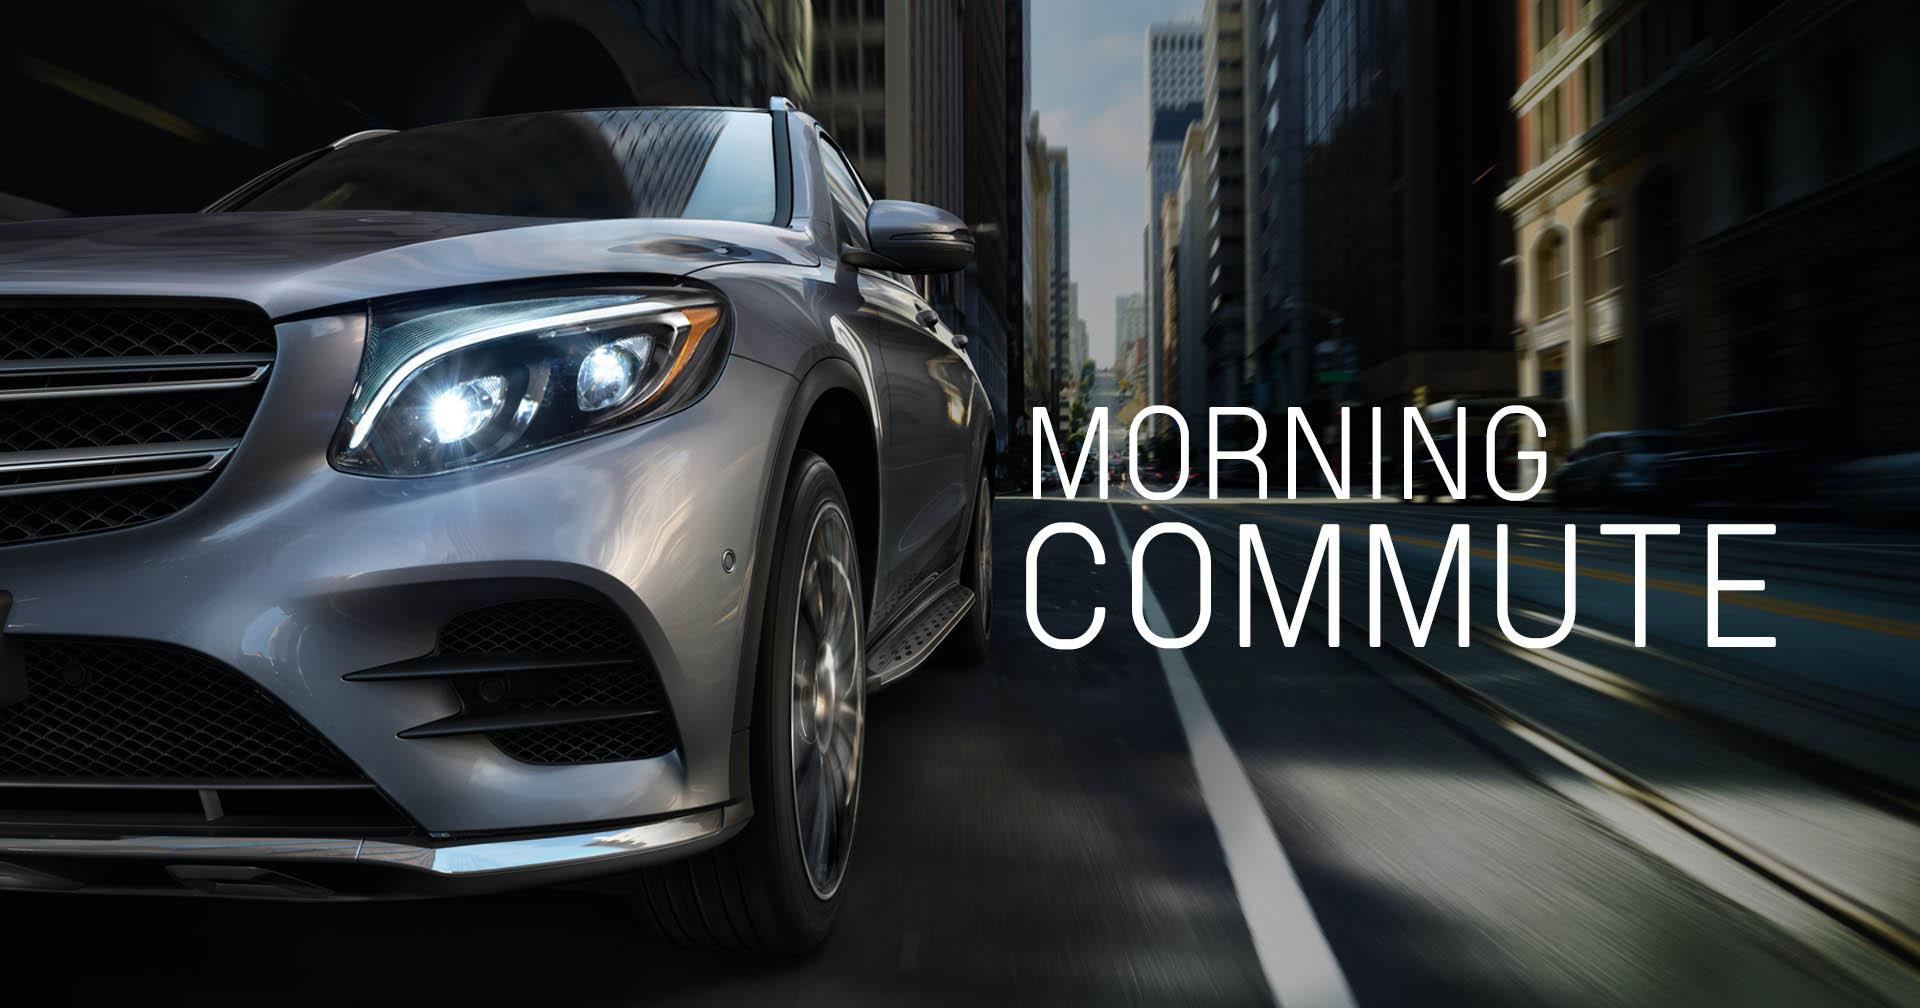 Morning Commute: Vol. II